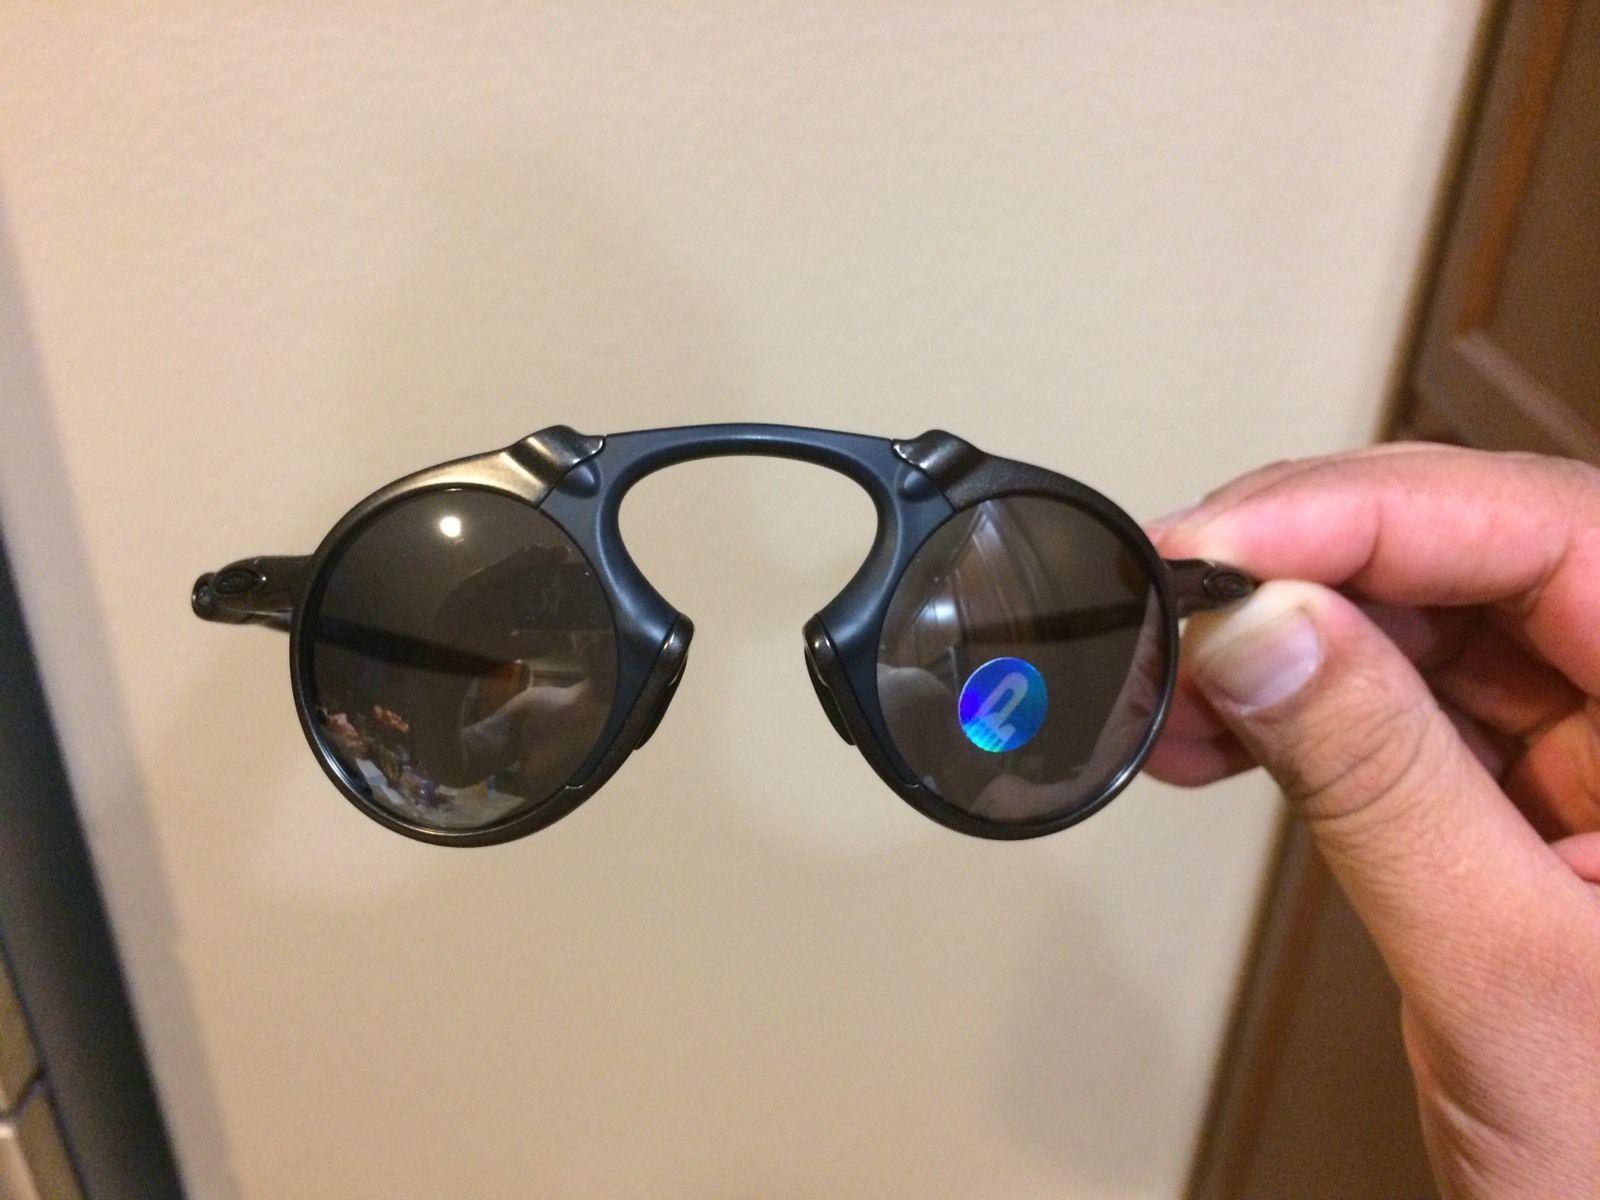 e7ef89060a3 ... aliexpress oakley madman steampunk sunglasses ebay 7495d e18f2